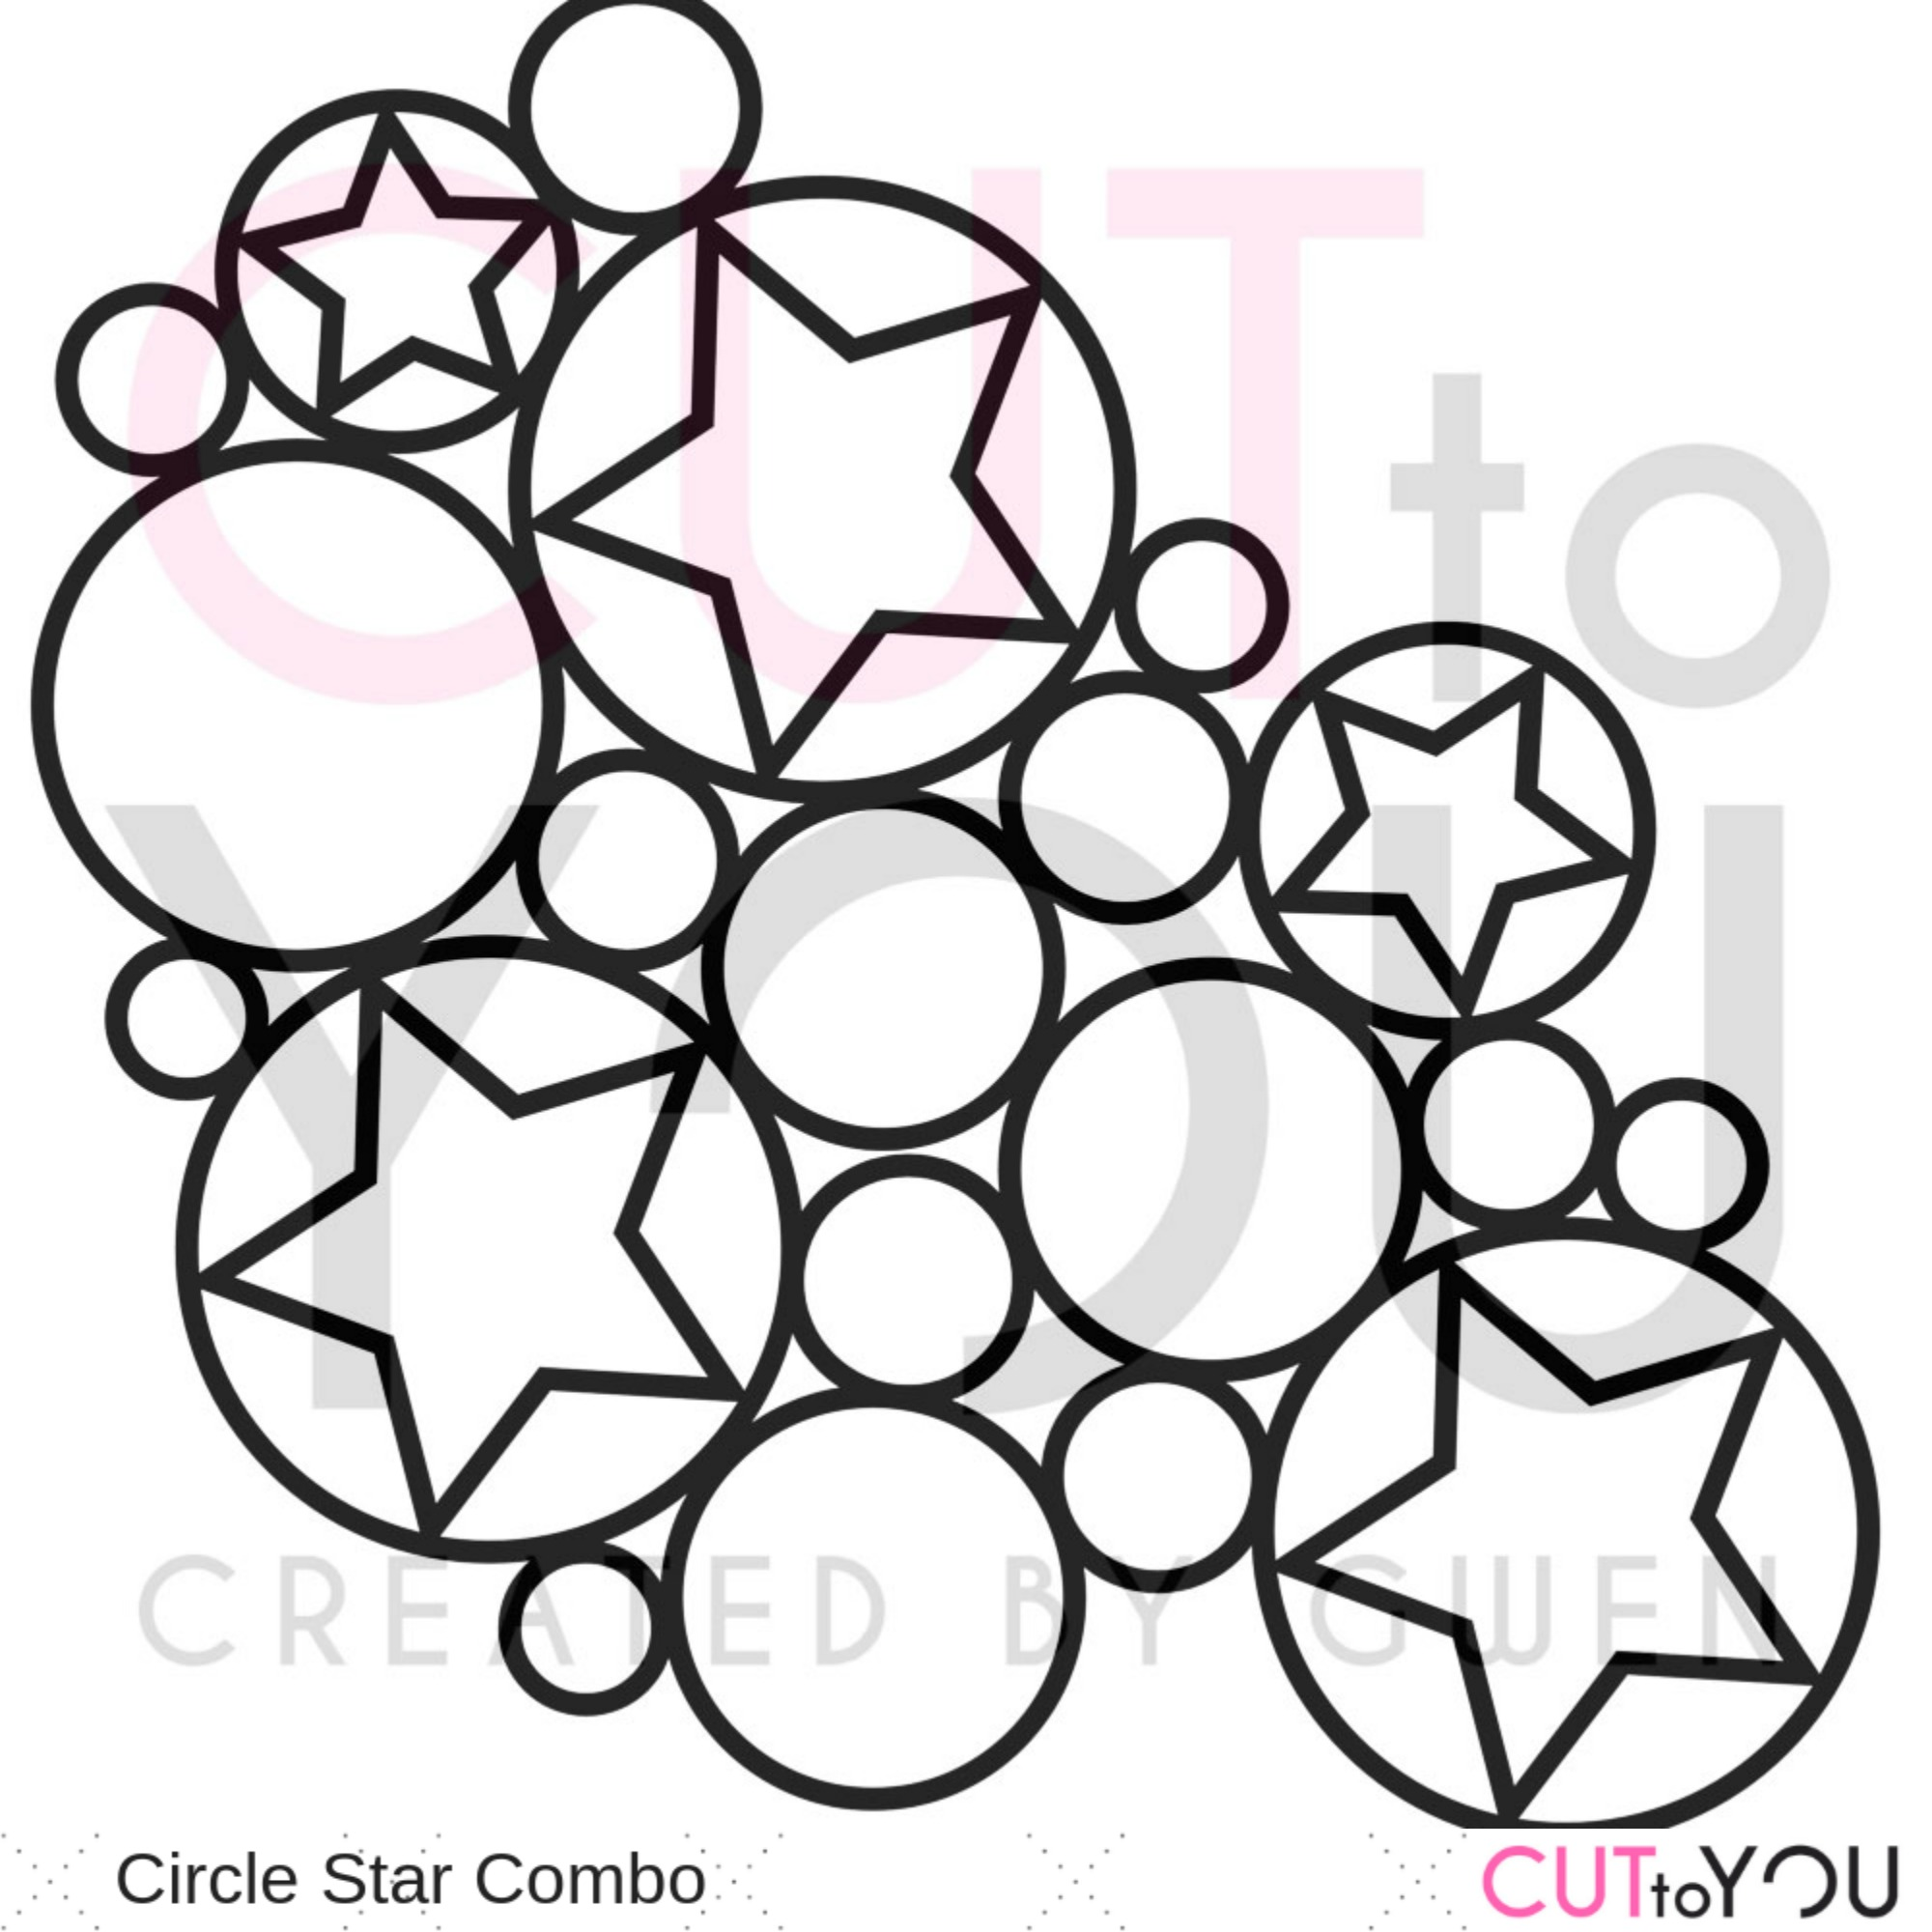 CTYCircleStarCombo